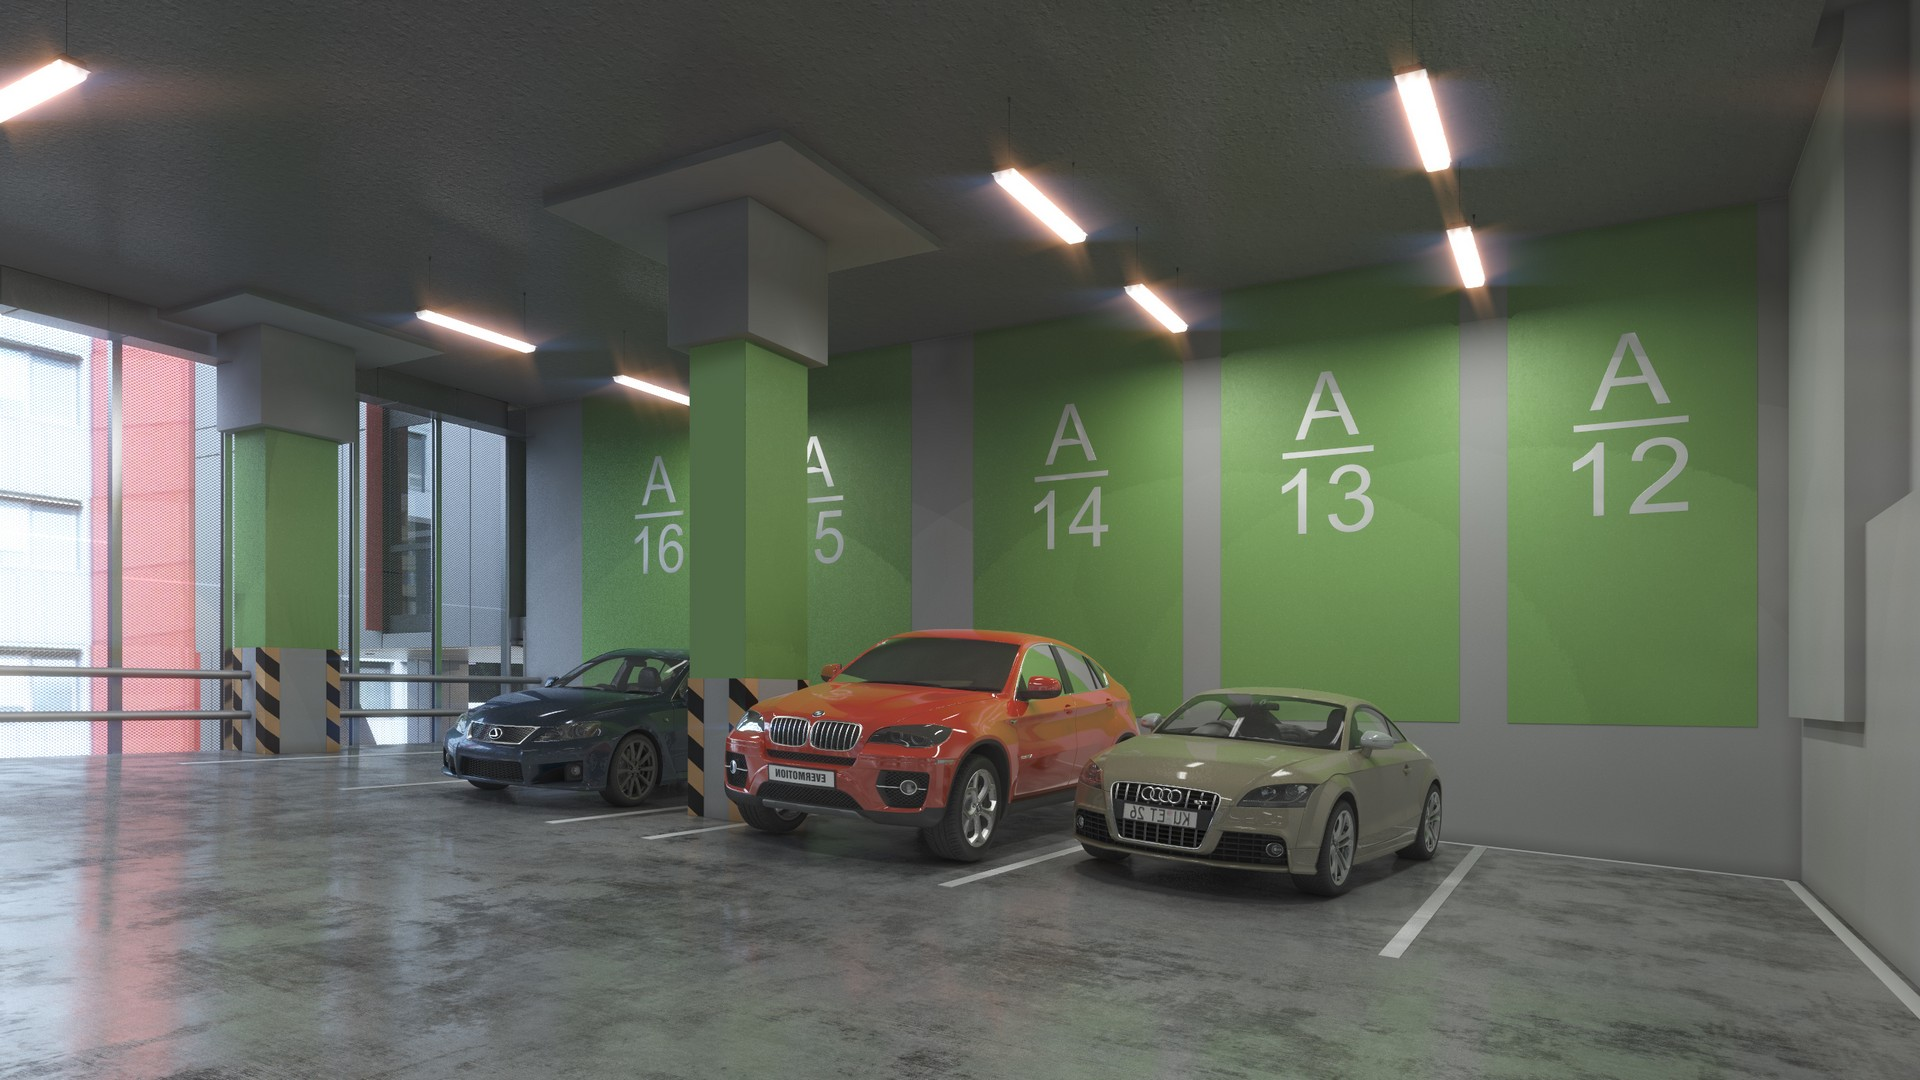 028 parking